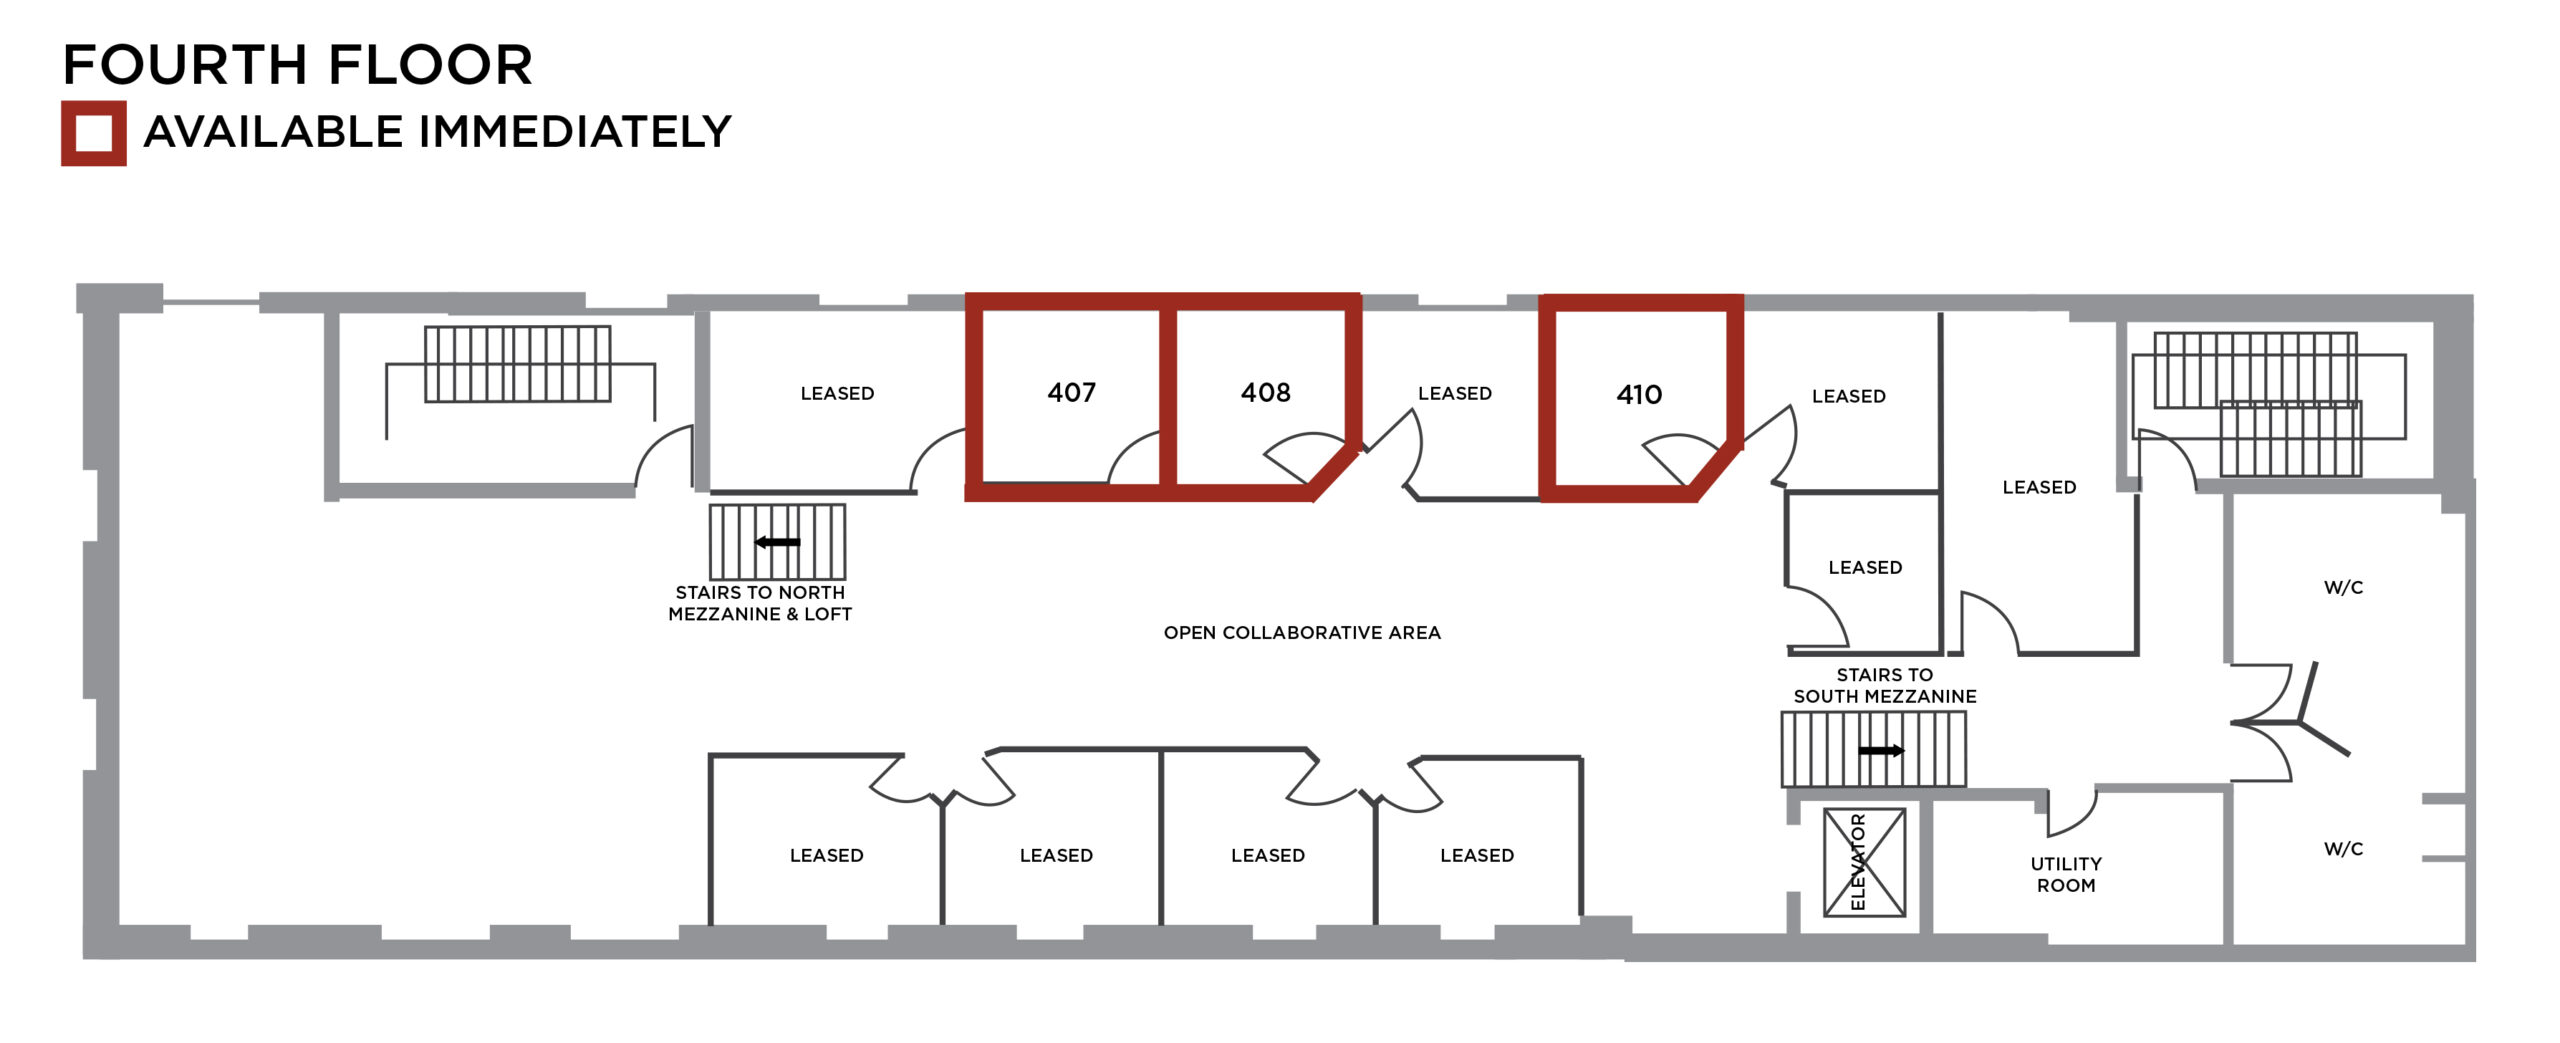 Fourth Floor Plan 12.23.2019